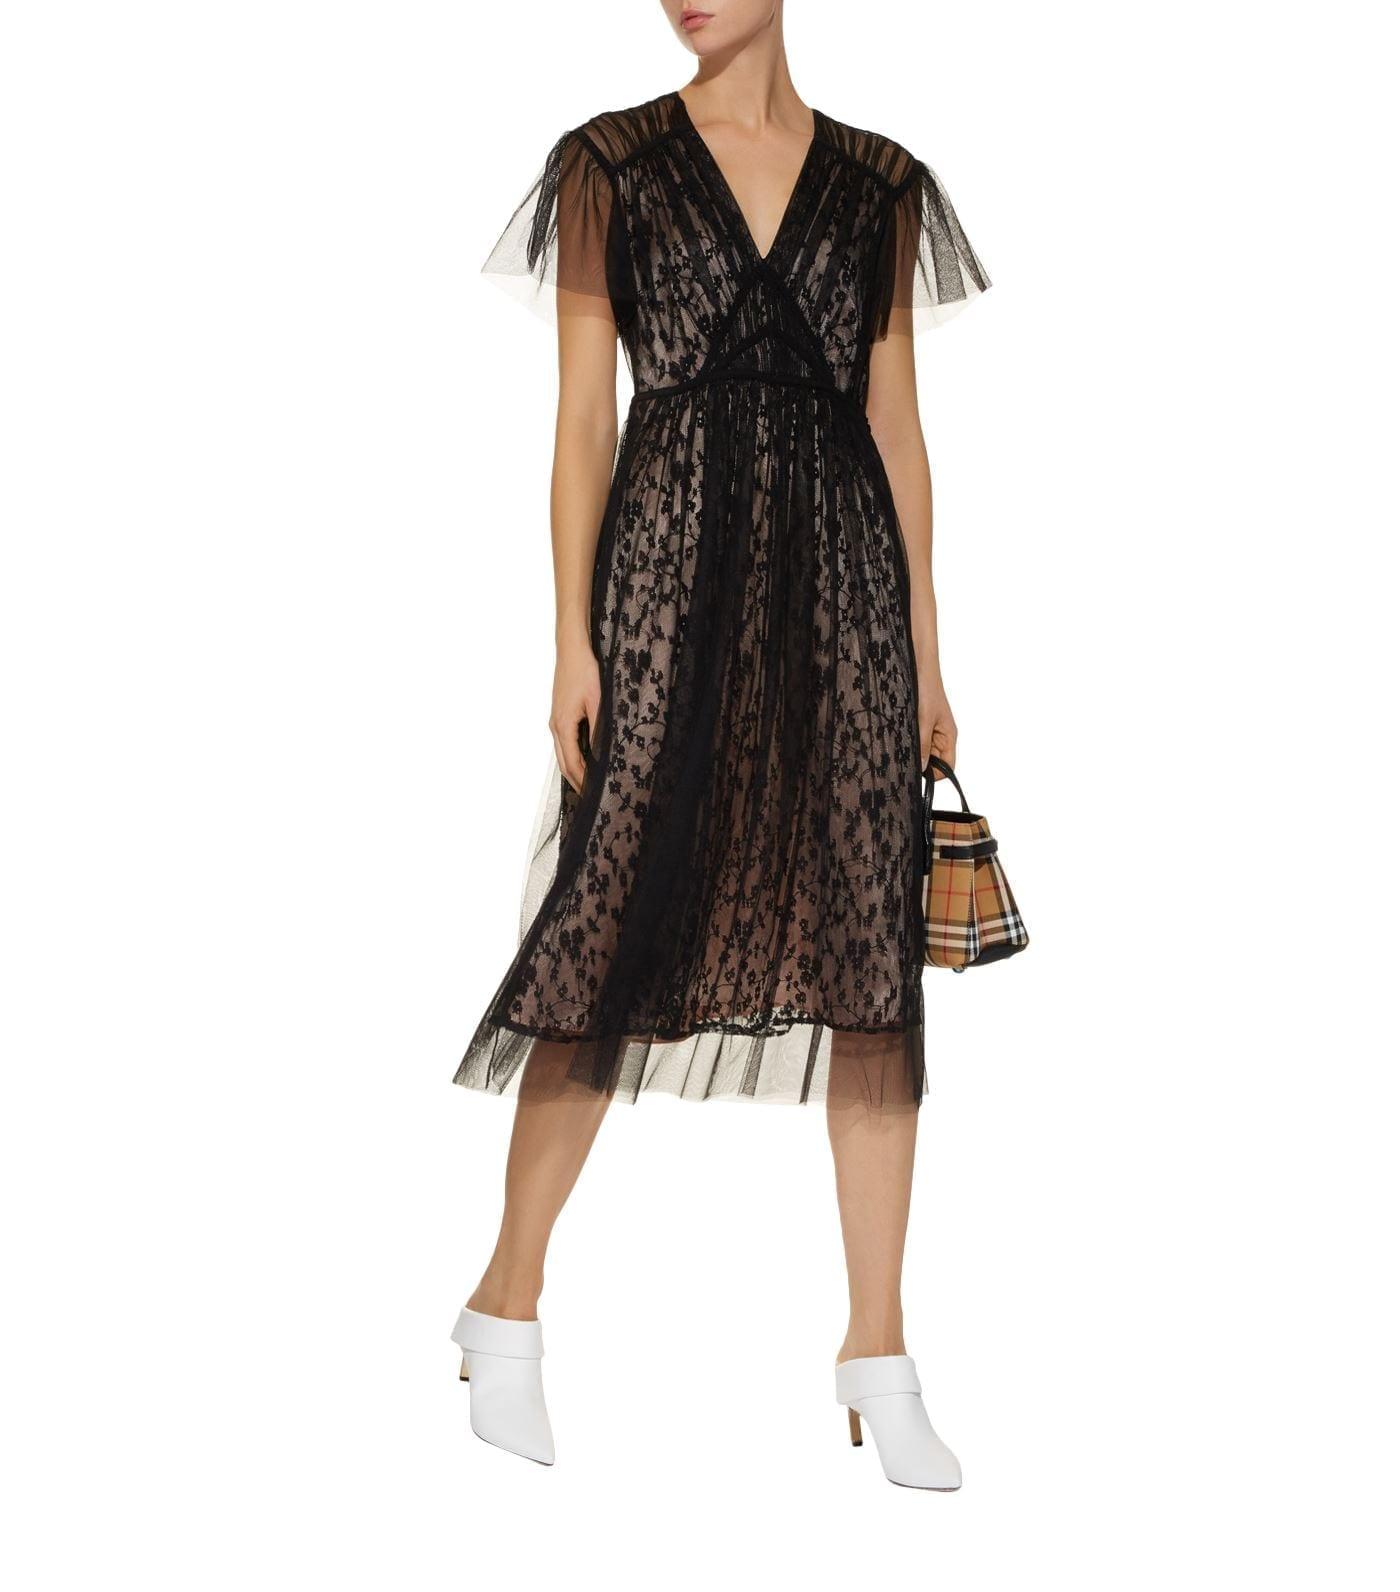 BURBERRY Lace Midi Black Dress